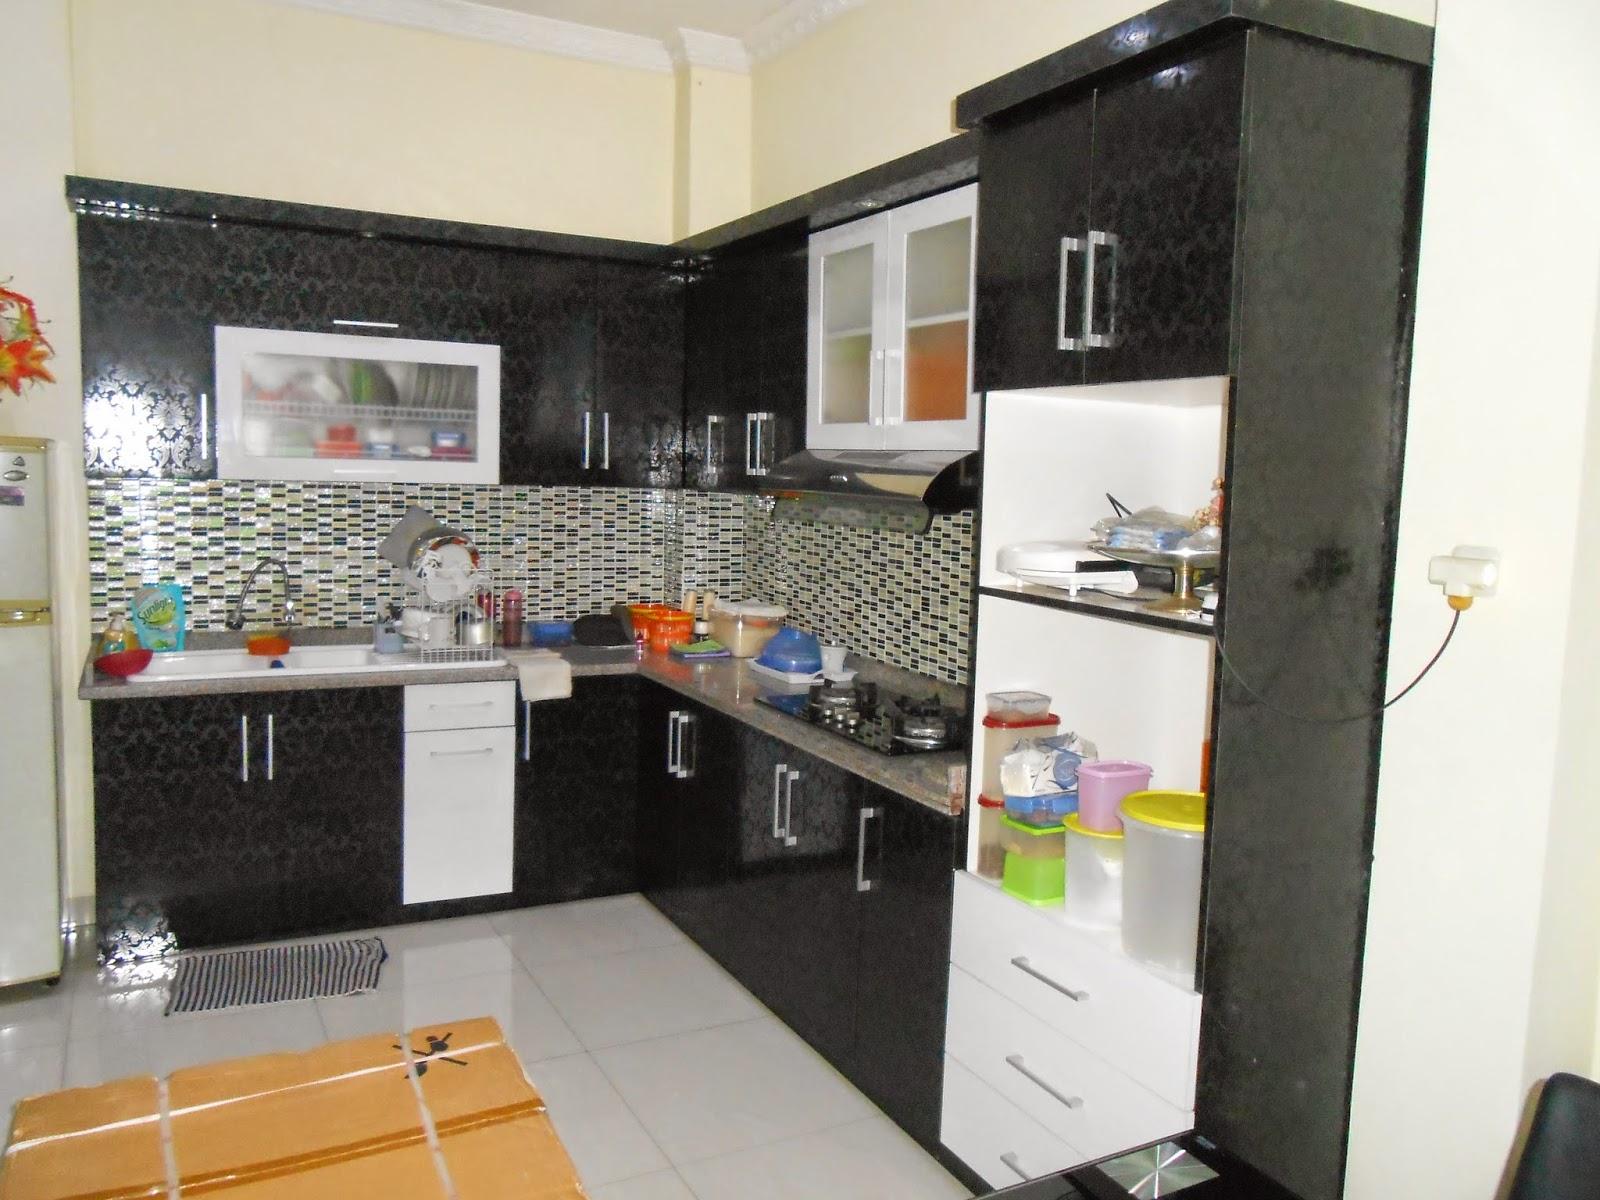 Berlian Kitchen Set Minimalis Murah Tips Kitchen Set Minimalis Modern Untuk Area Jabodetabek Cikarang Bekasi Cibitung Tambun